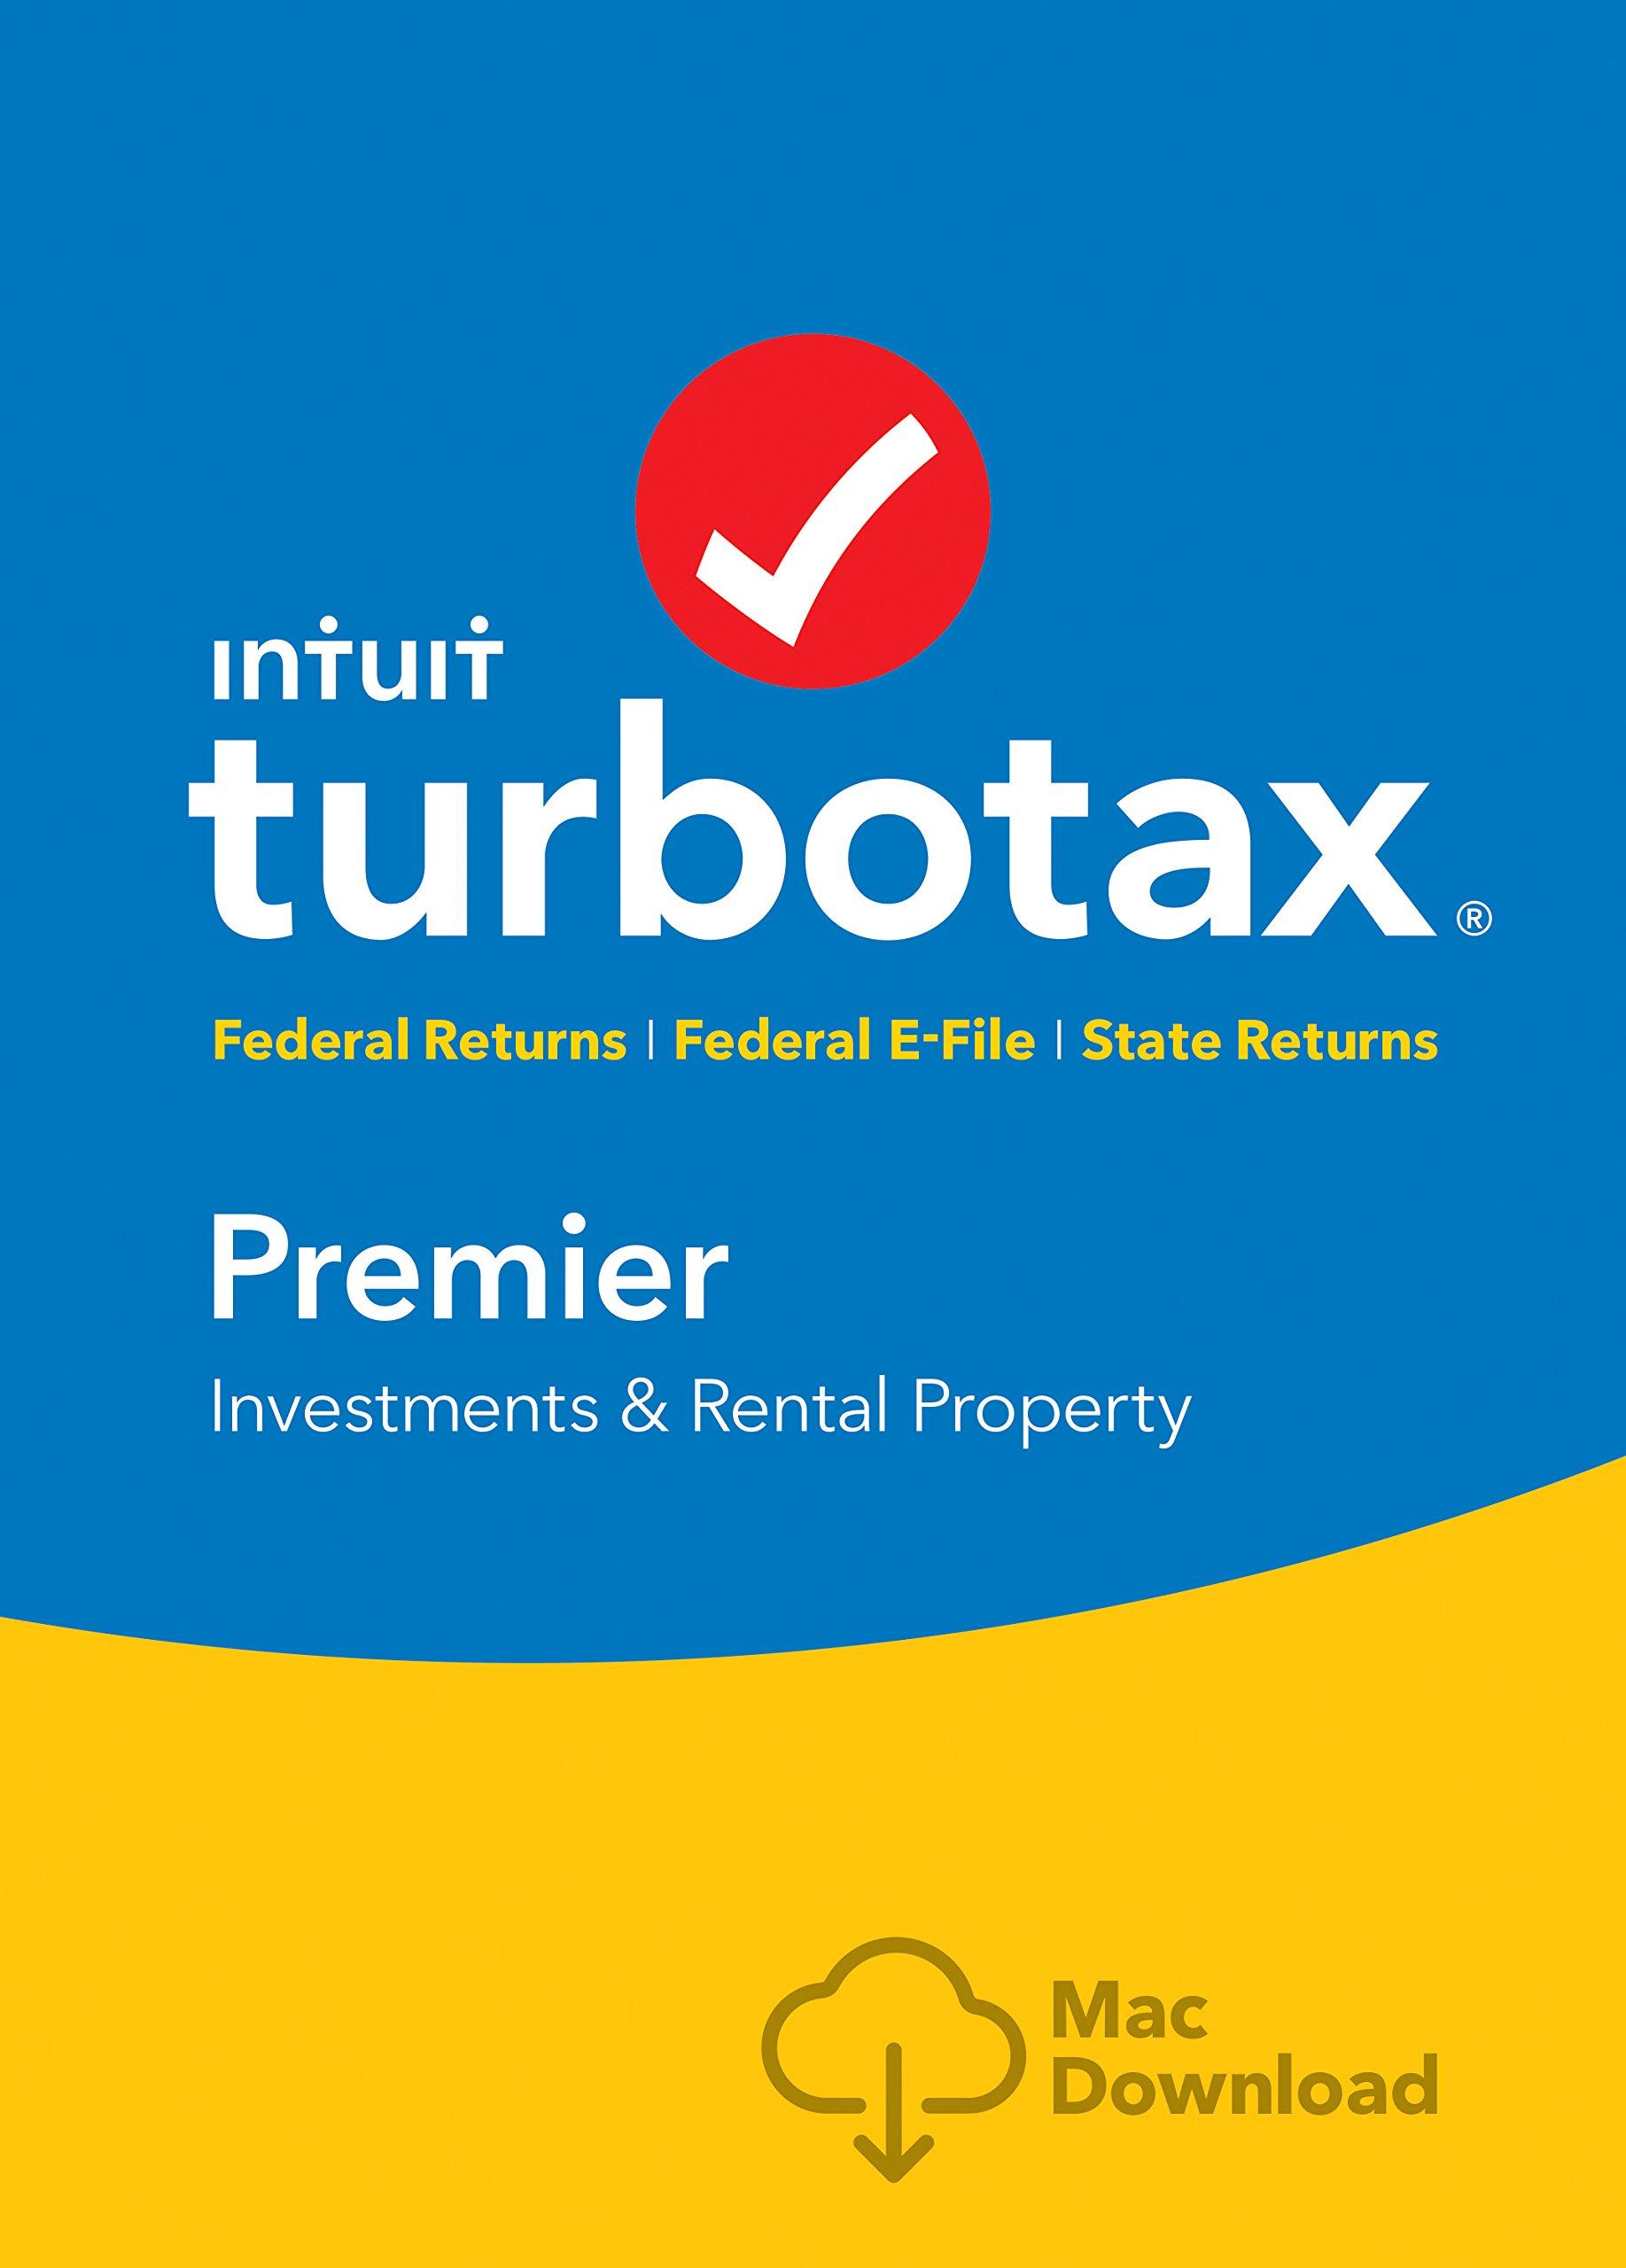 Turbotax Premier 00000000000166